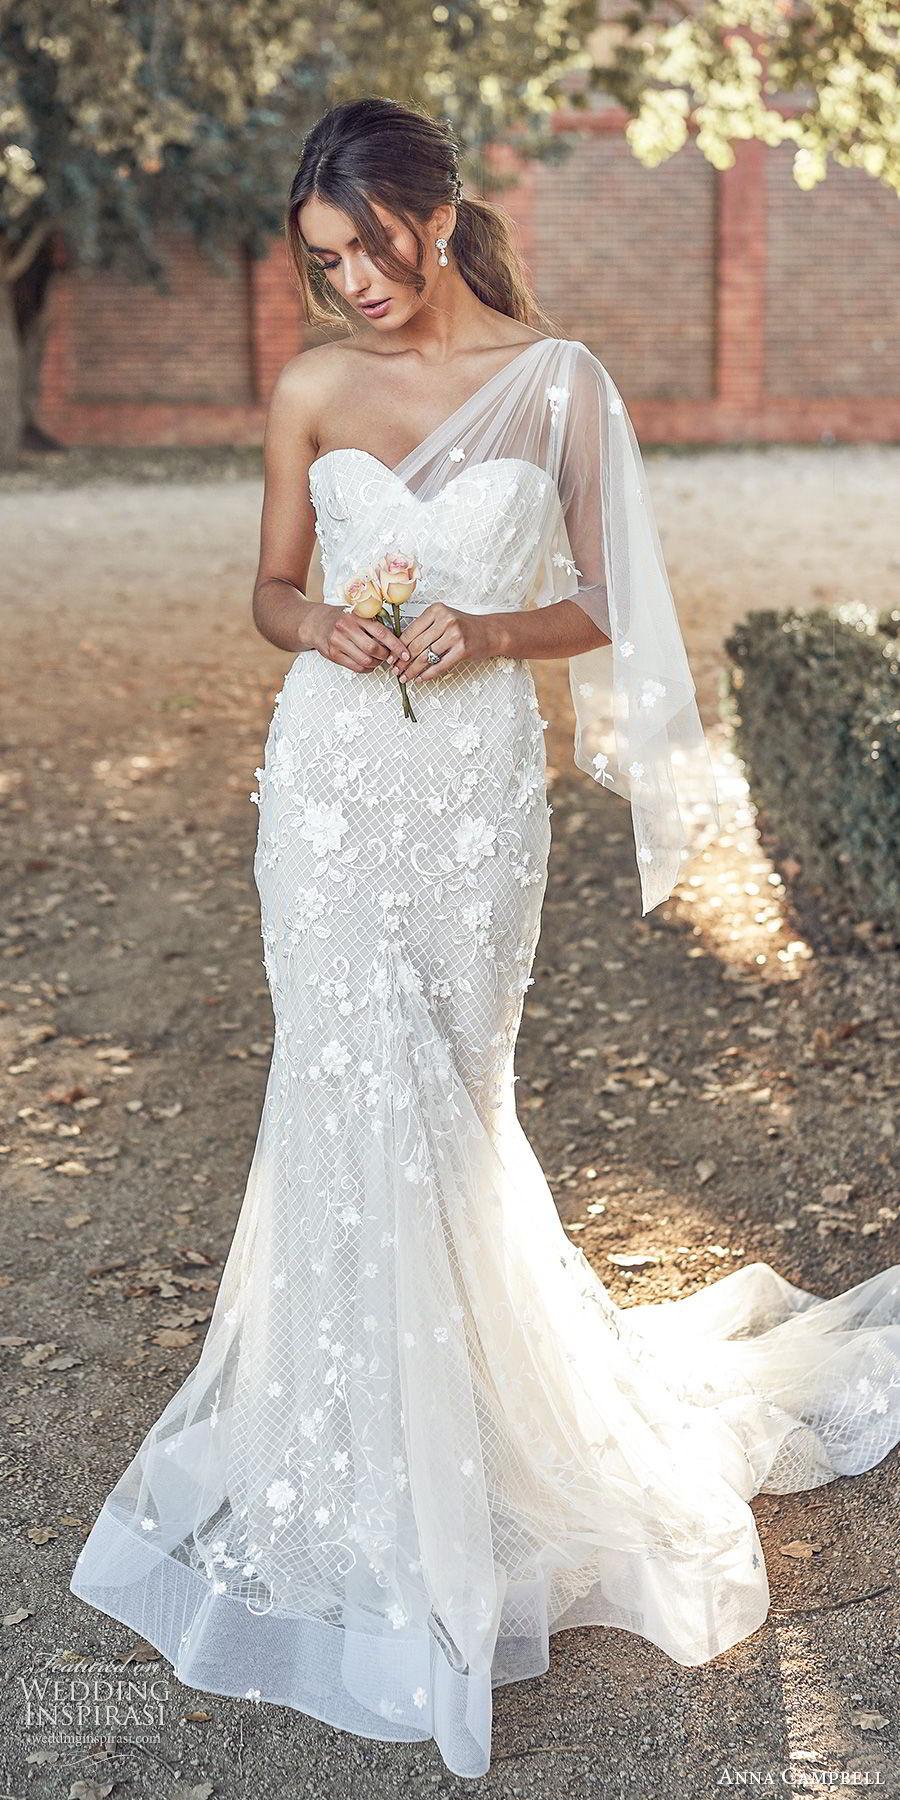 anna campbell 2020 bridal illusion one shoulder sweetheart neckline fully embellished embroidered lace sheath wedding dress (11) elegant romantic chapel train mv